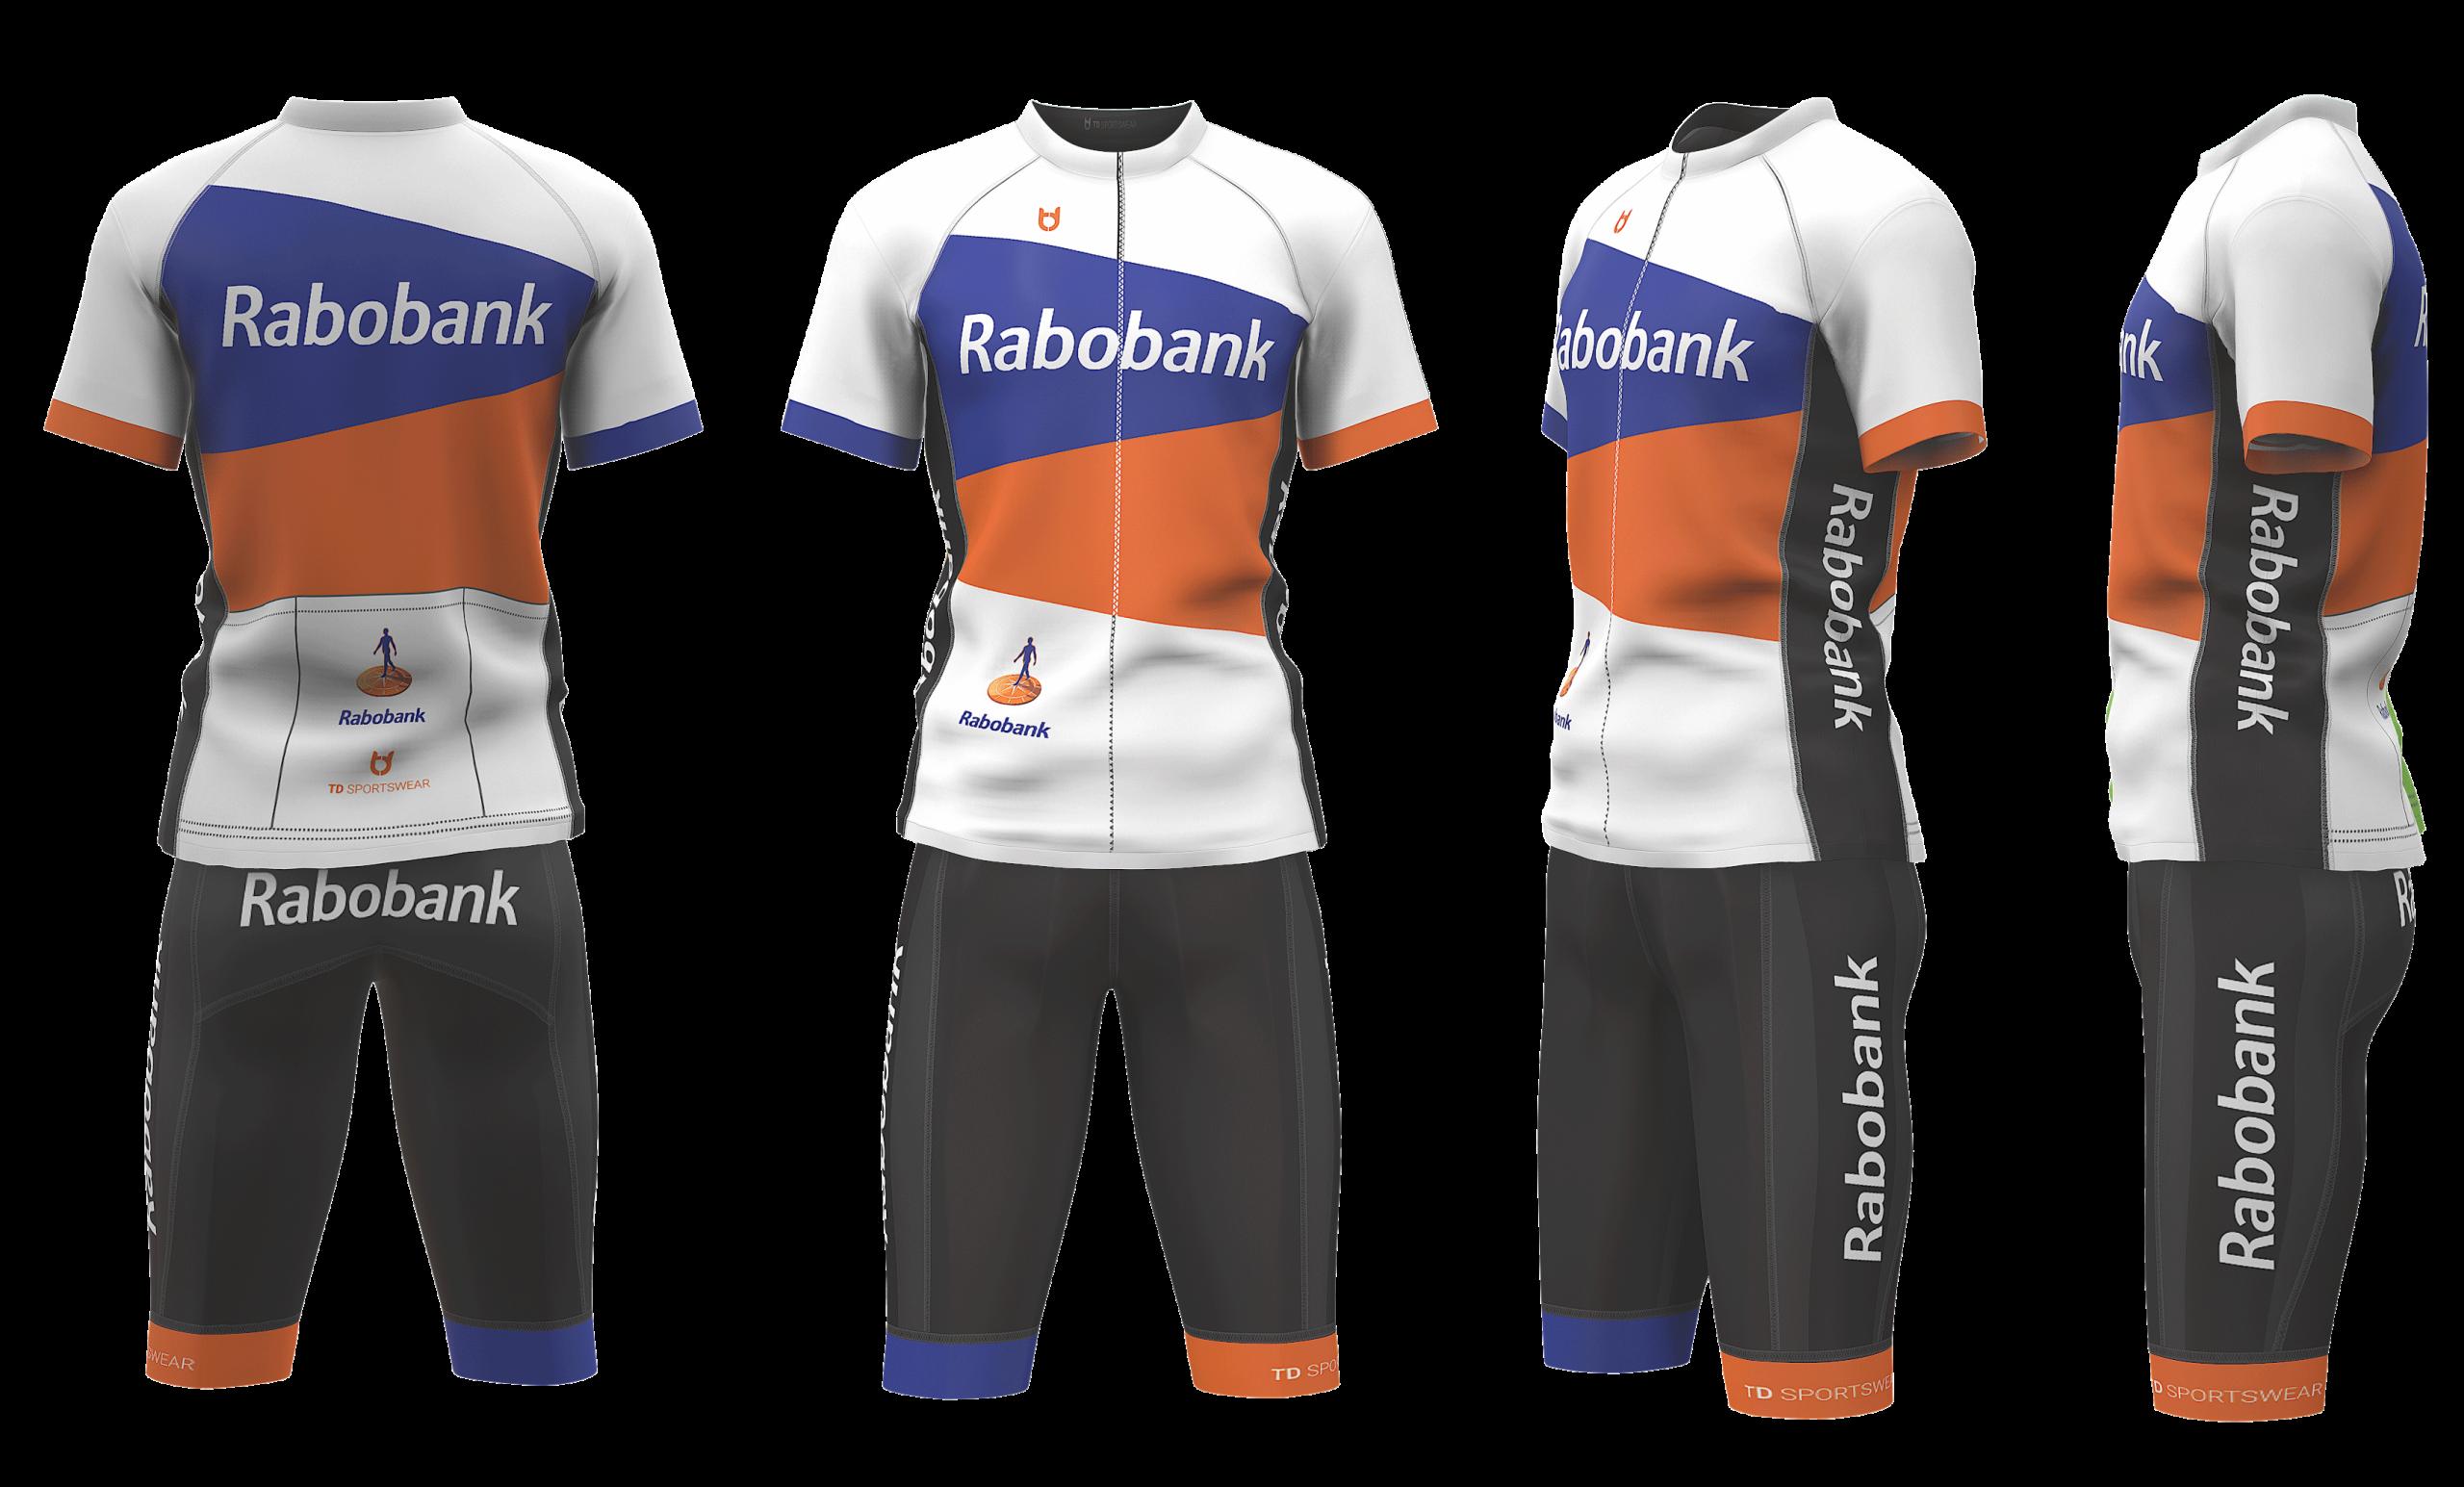 Rabobank wielerkleding ontwerp teamkleding custom